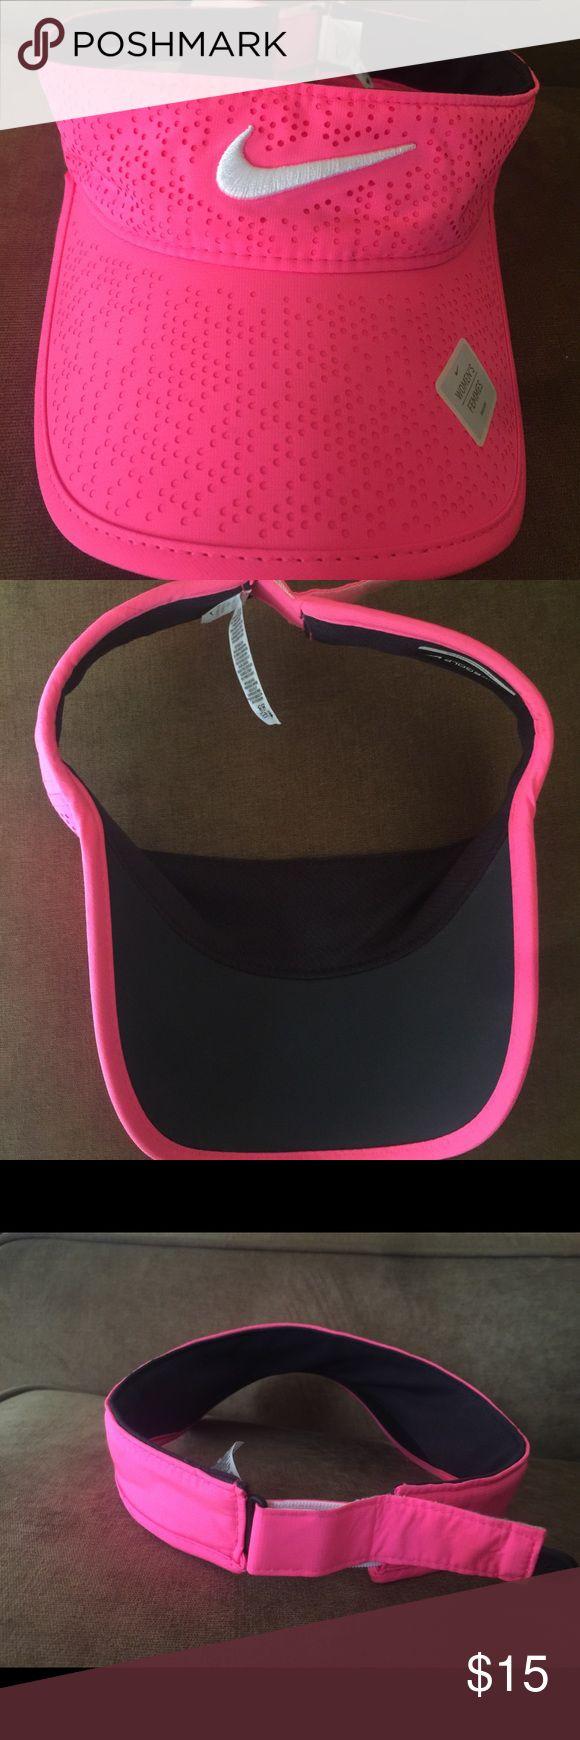 Nike Visor Hat Nike, Hyper pink, Visor hat. Nike Accessories Hats